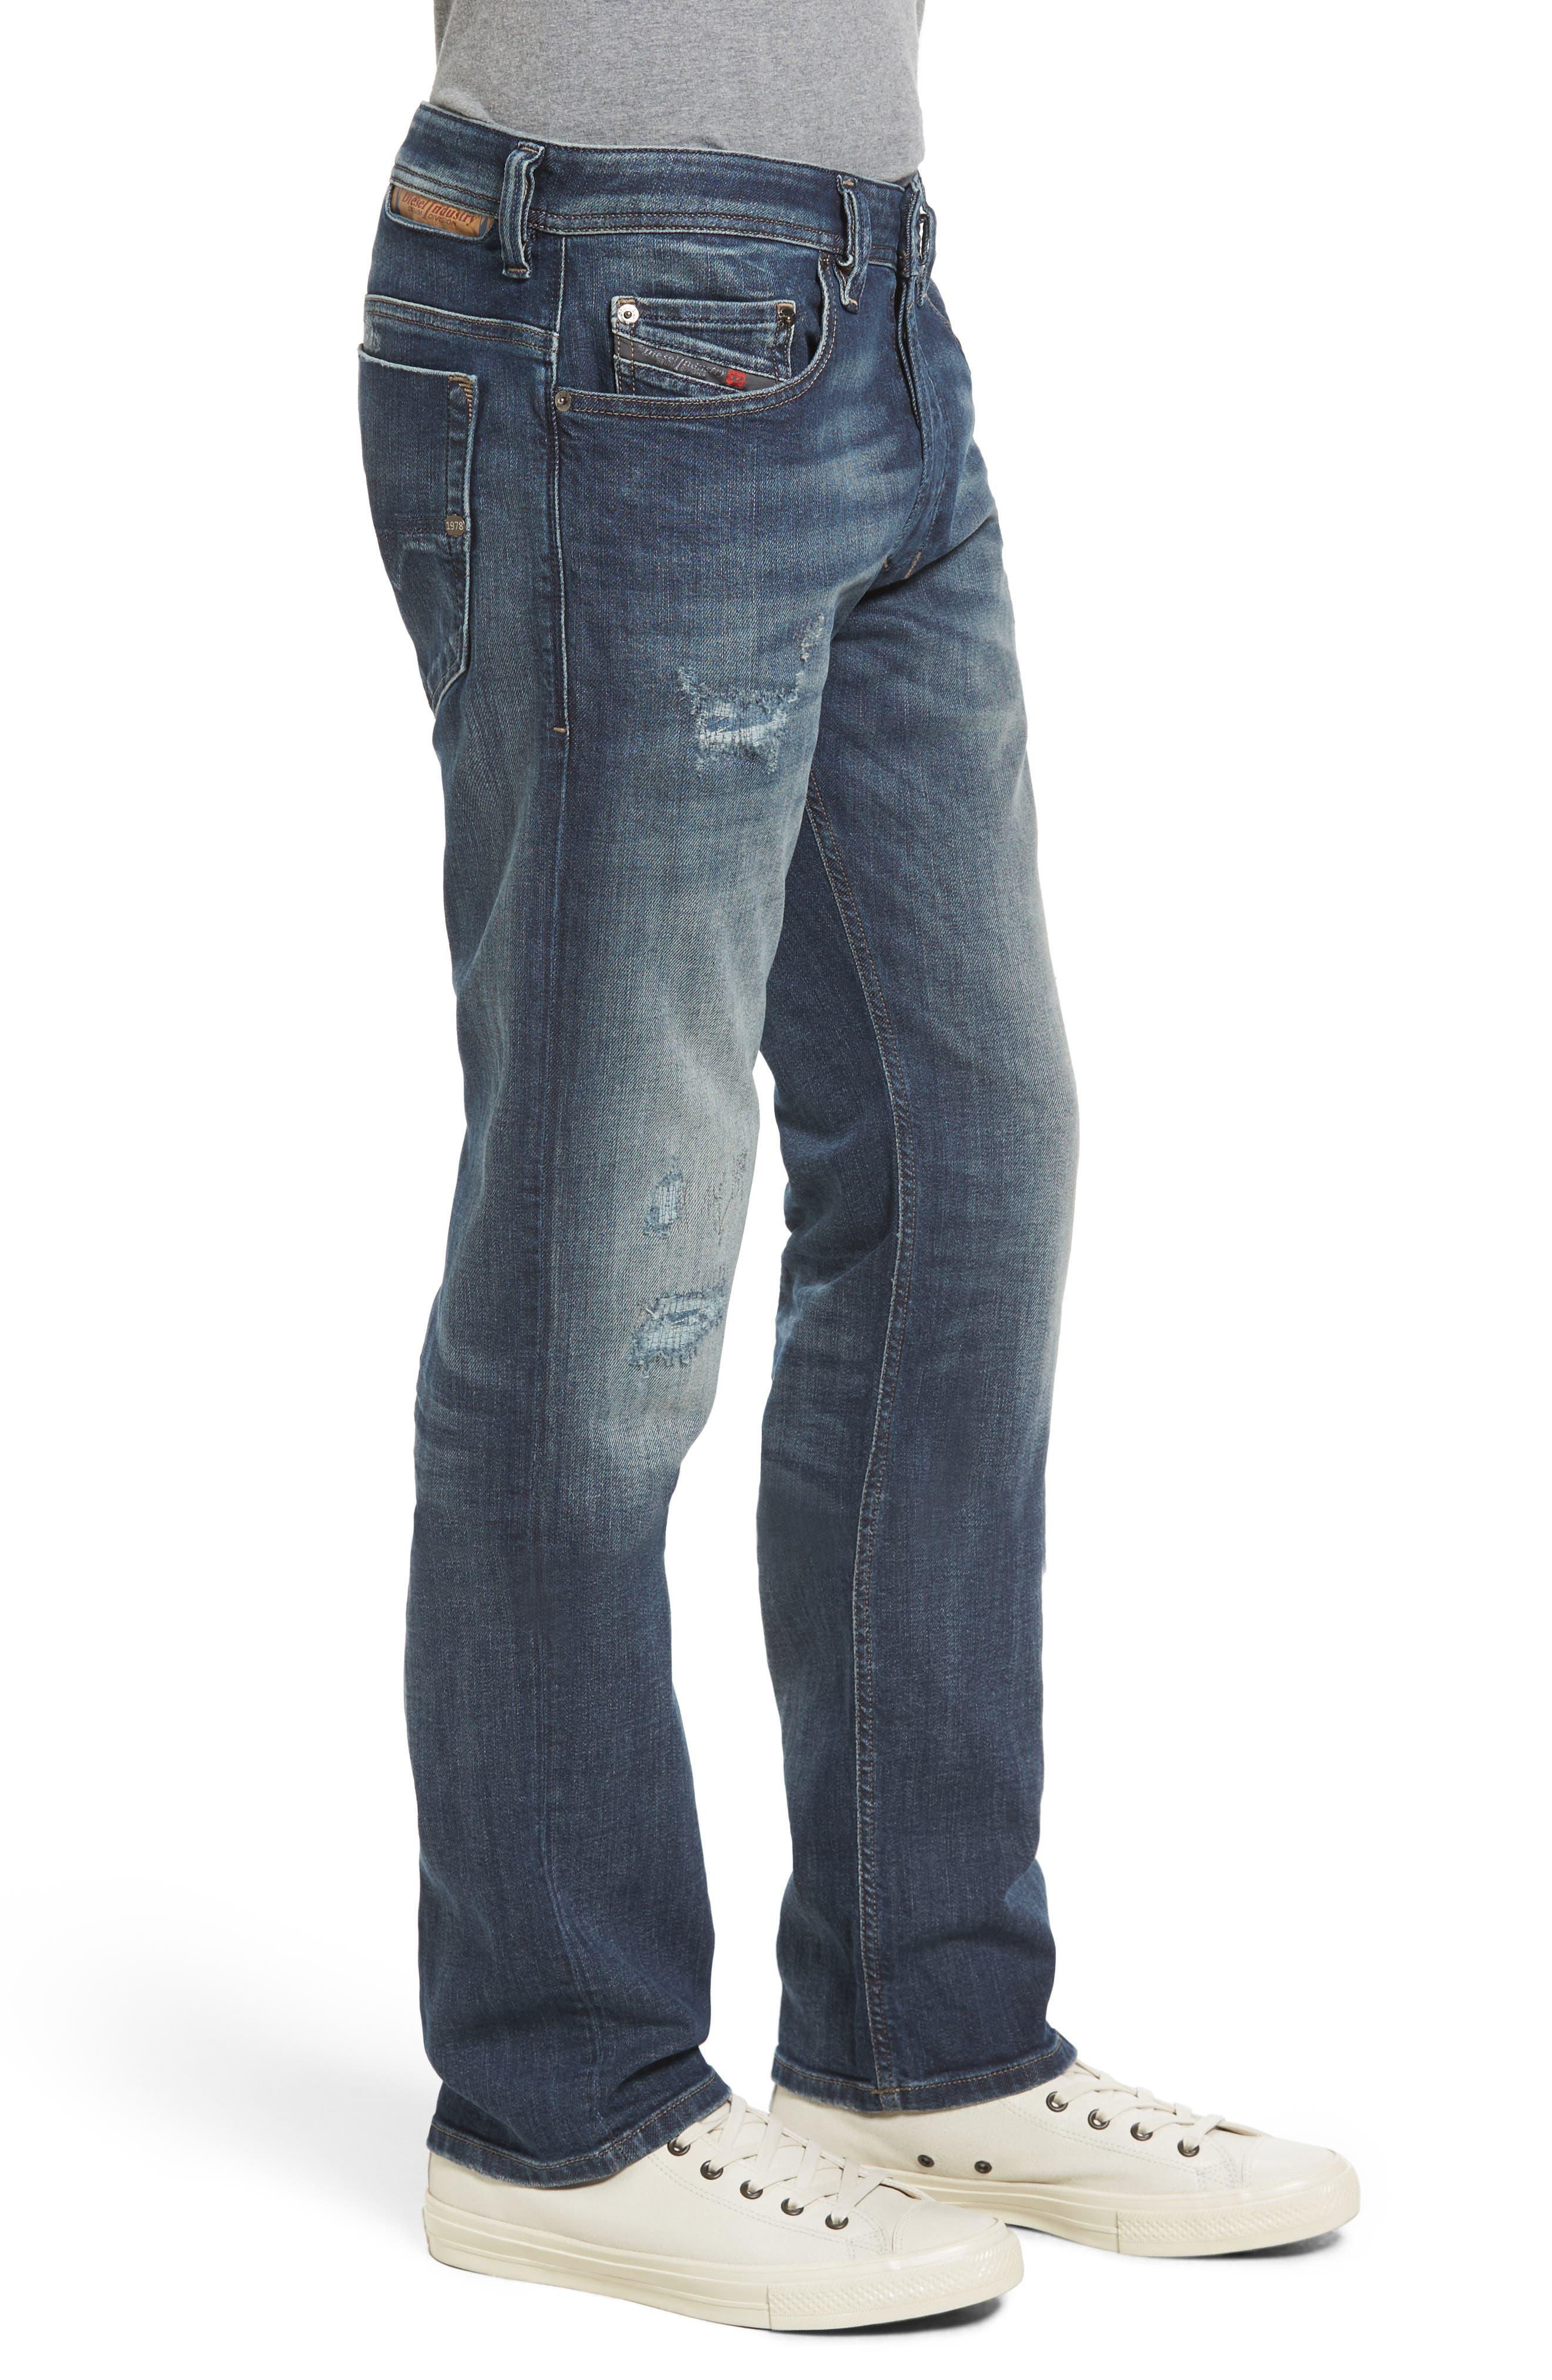 Safado Slim Straight Fit Jeans,                             Alternate thumbnail 3, color,                             860K